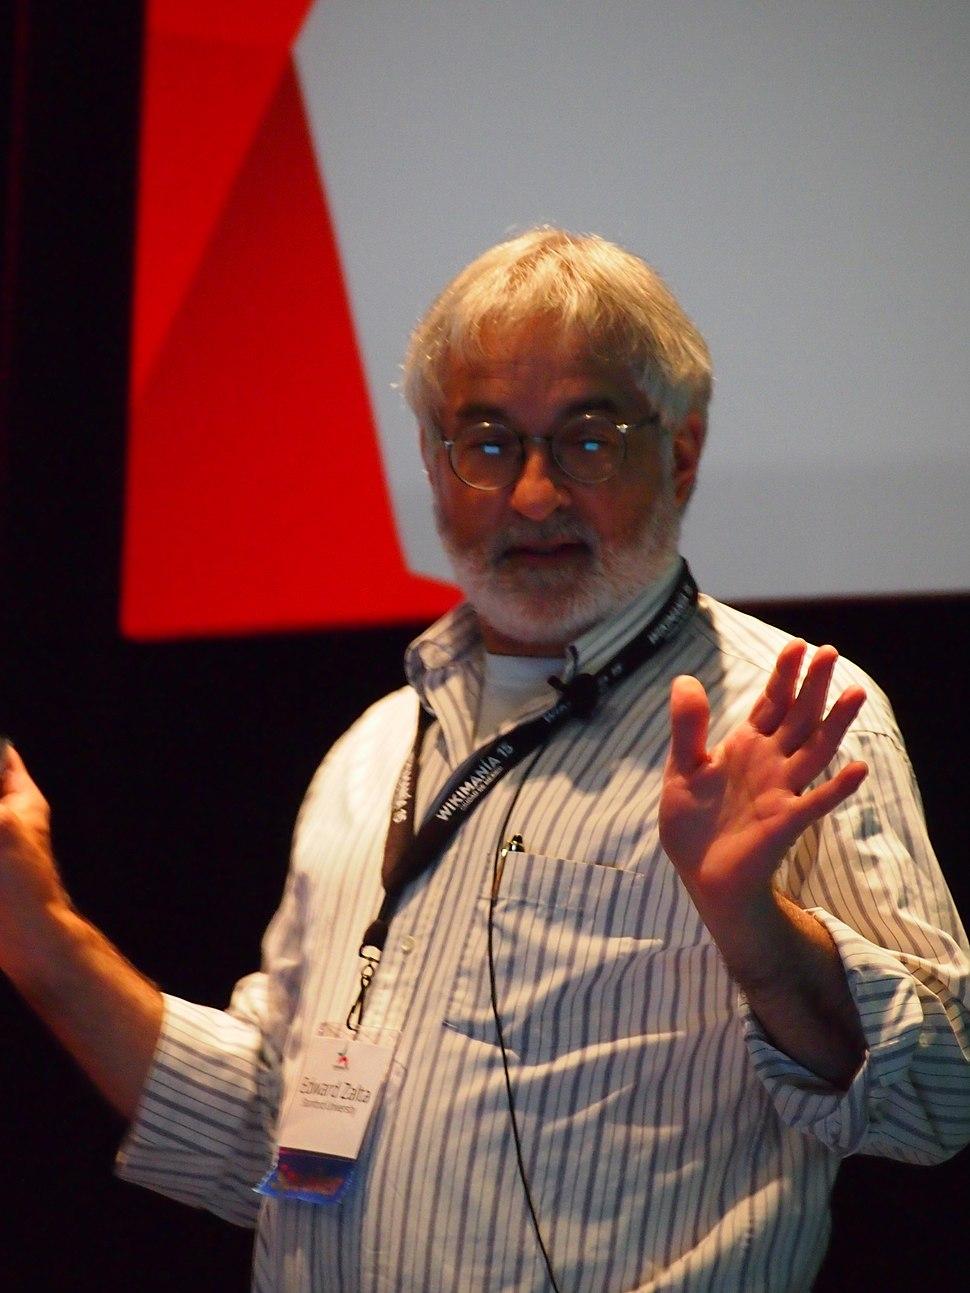 Photograph of Zalta speaking at Wikimania 2015